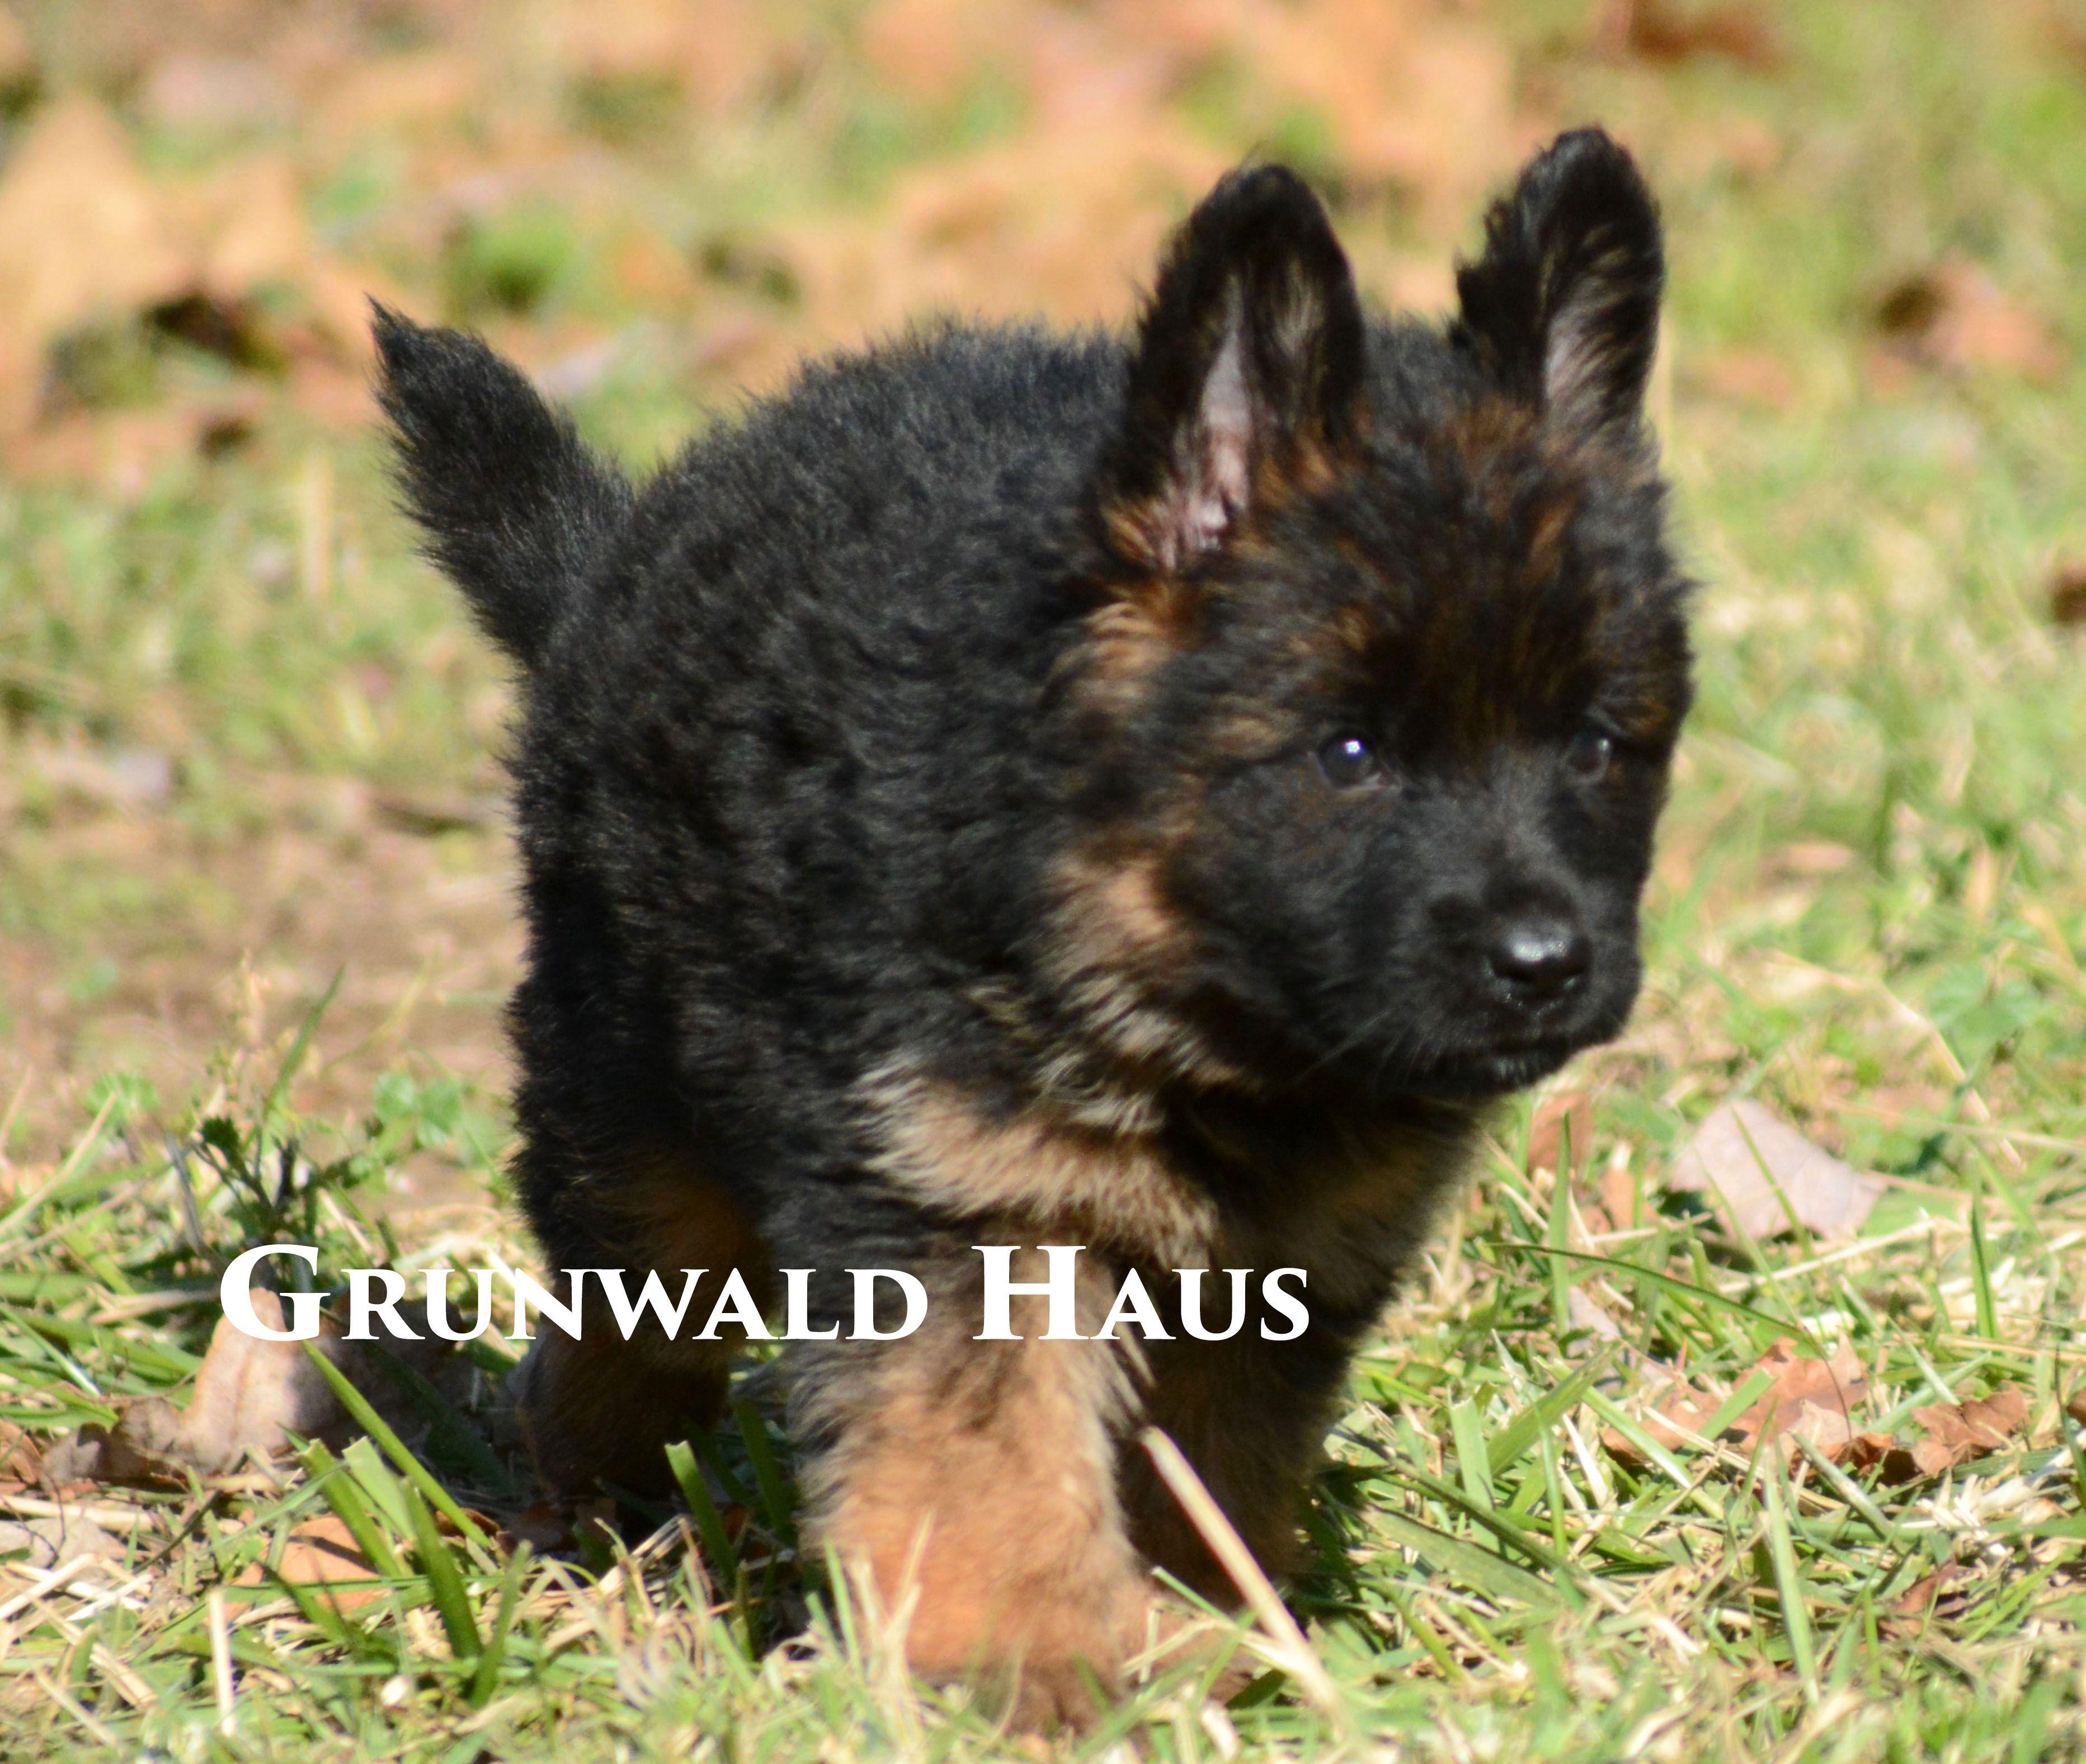 Long Coat German Shepherd Puppies At Grunwald Haus Usa German Shepherd Puppies German Shepherd Dogs And Puppies